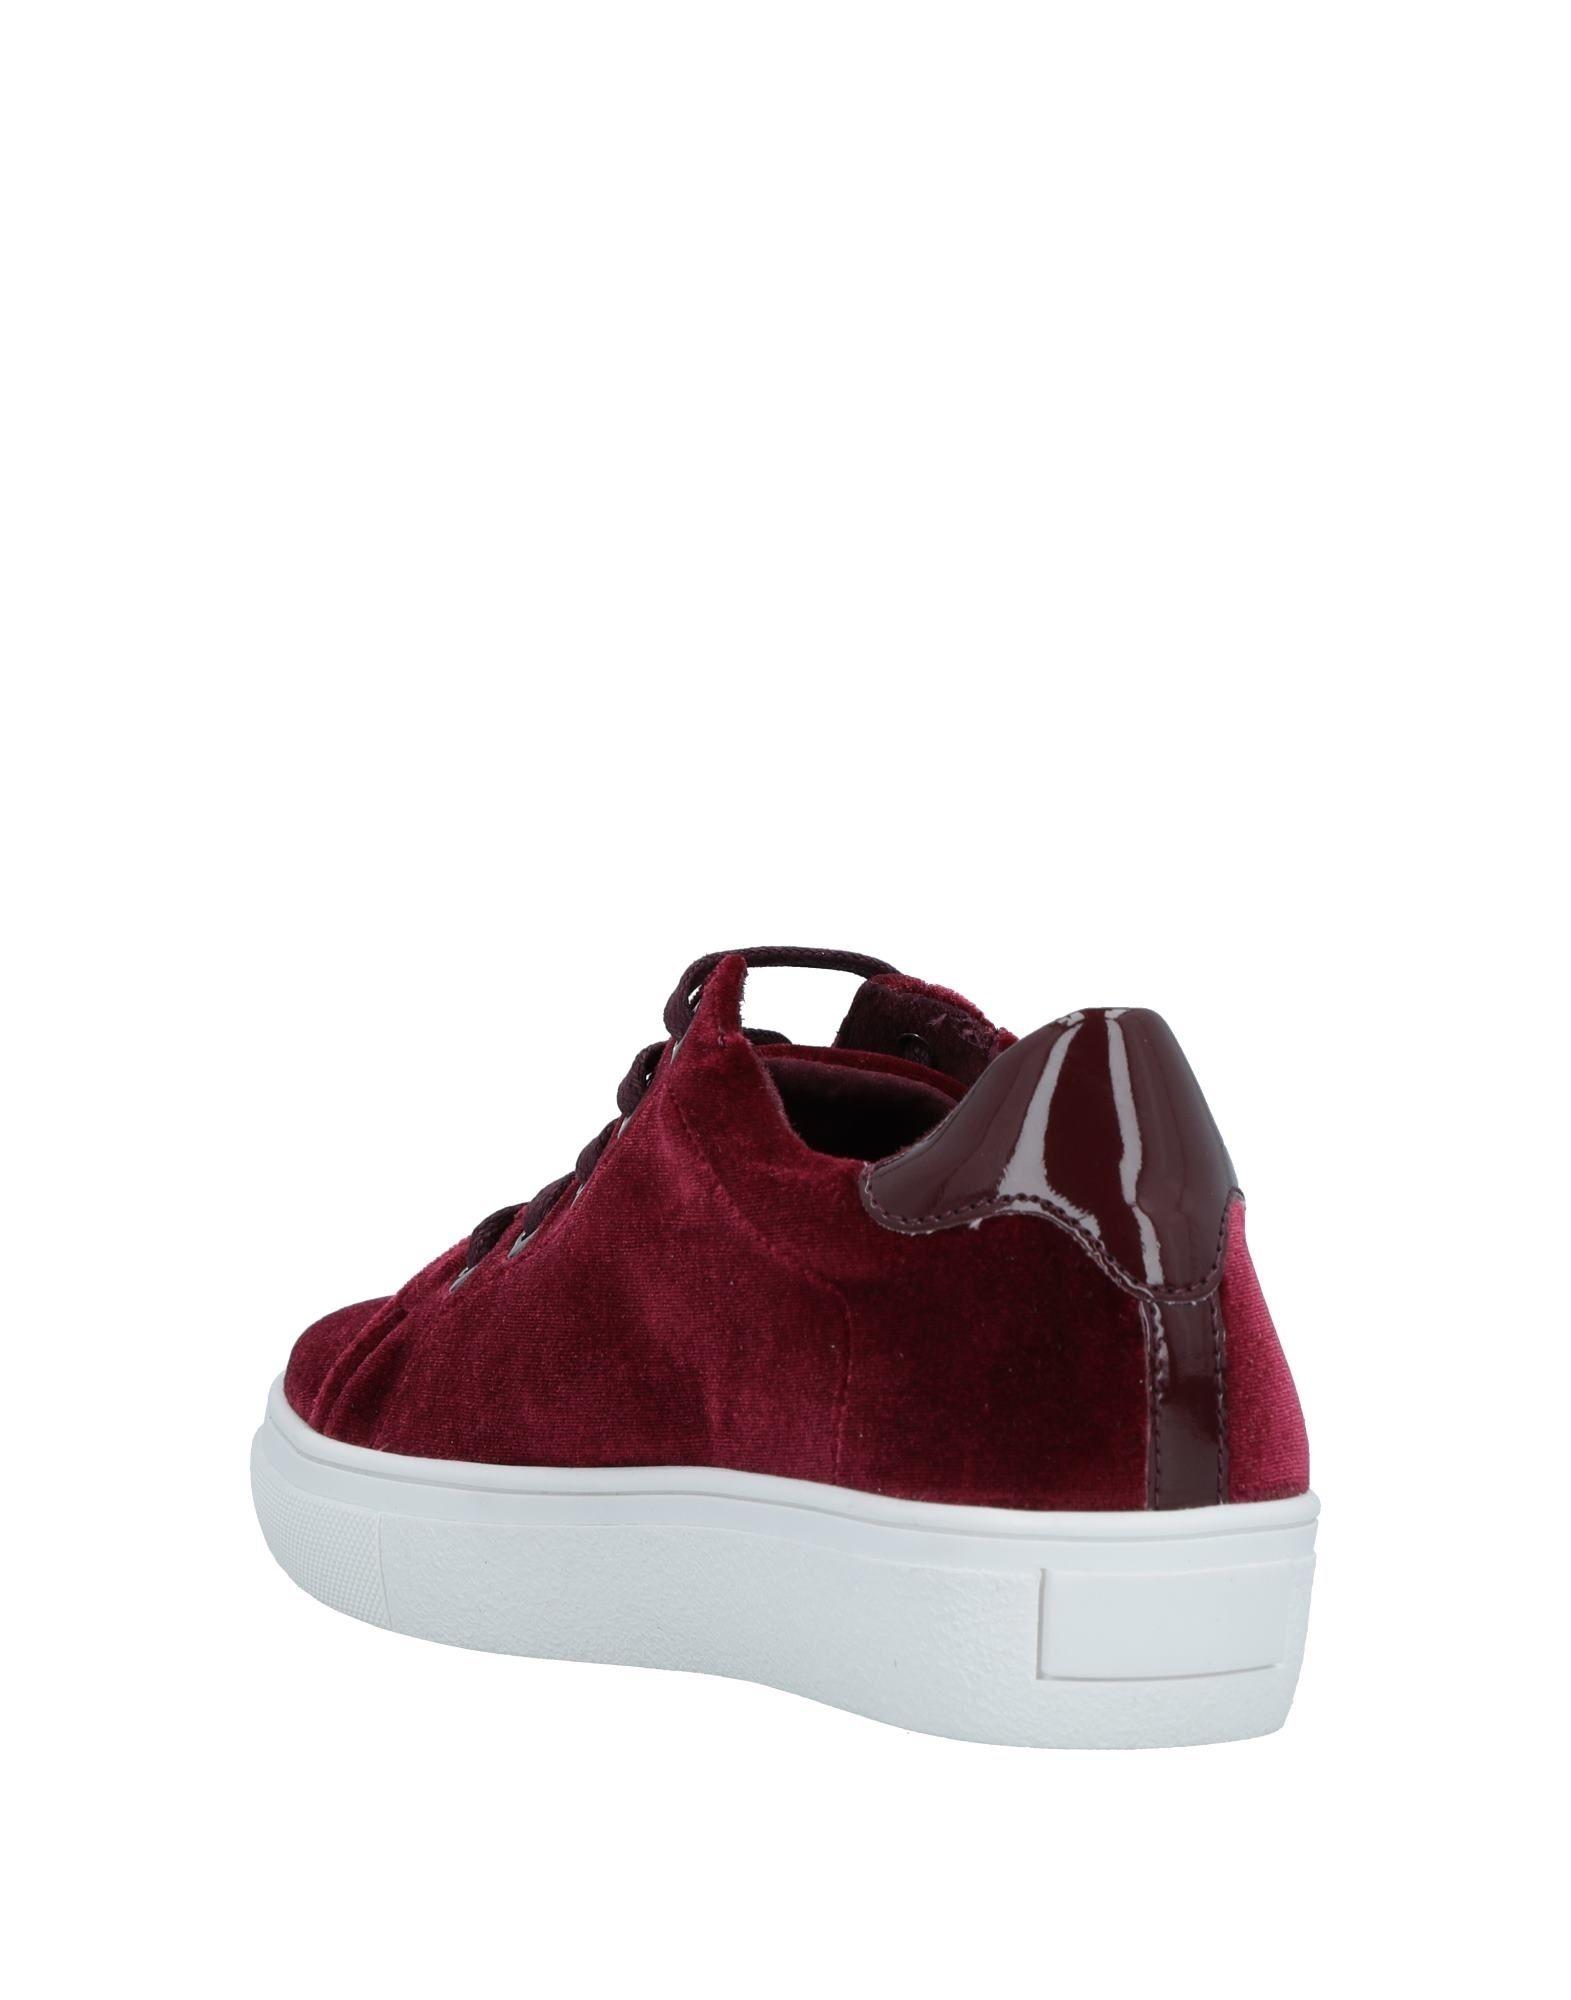 Maria Barcelo Sneakers  Damen  Sneakers 11521316CD Neue Schuhe 441dc1